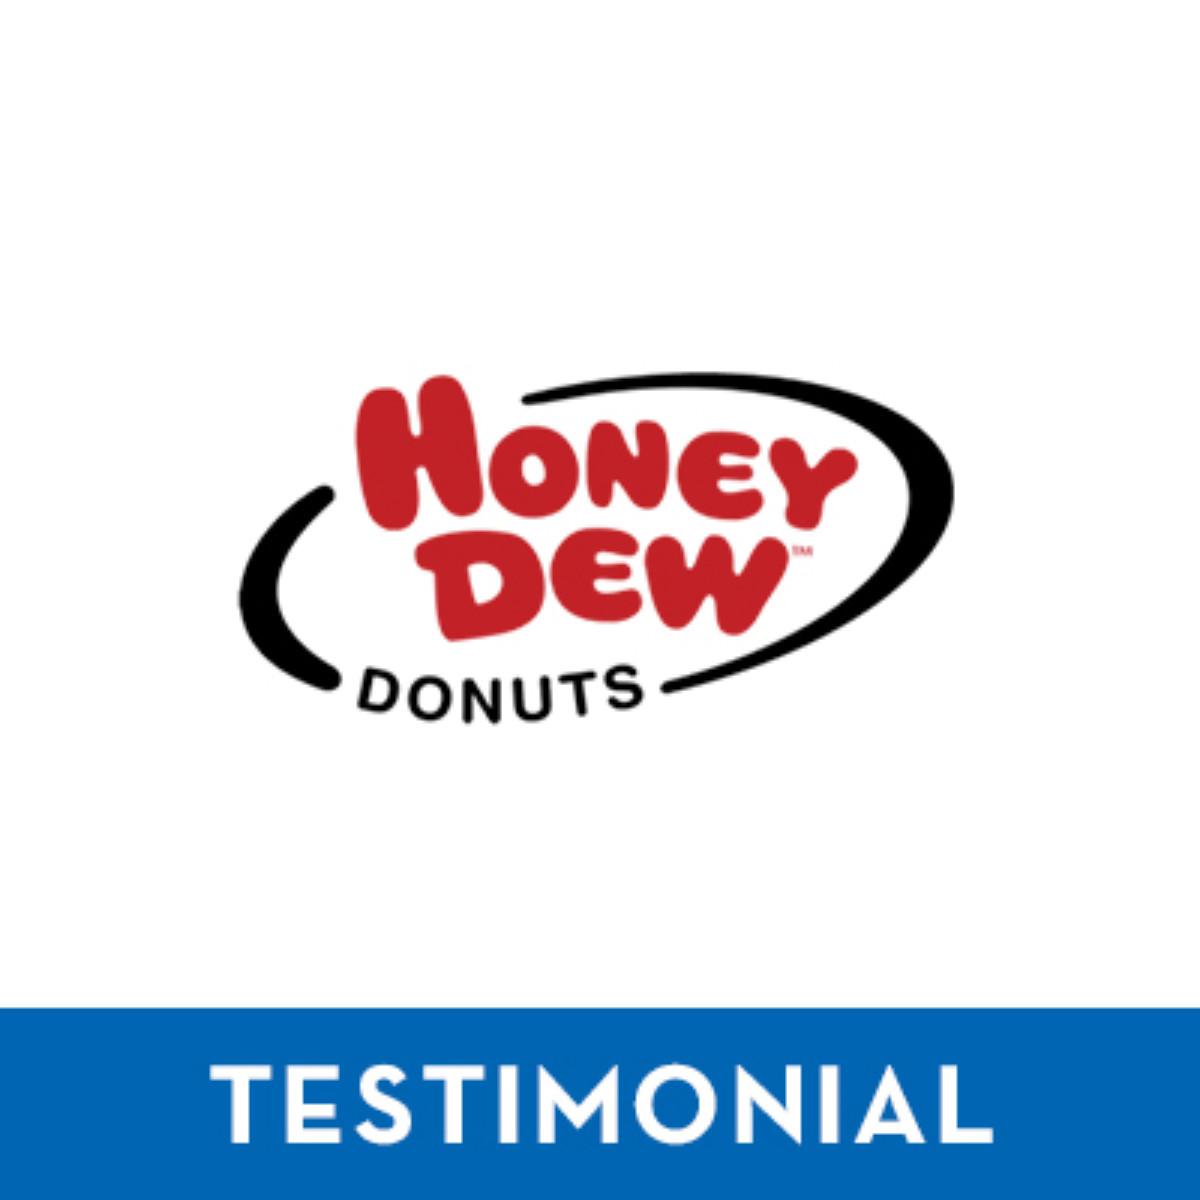 HONEY_DEW_TESTIMONIAL-1200x1200